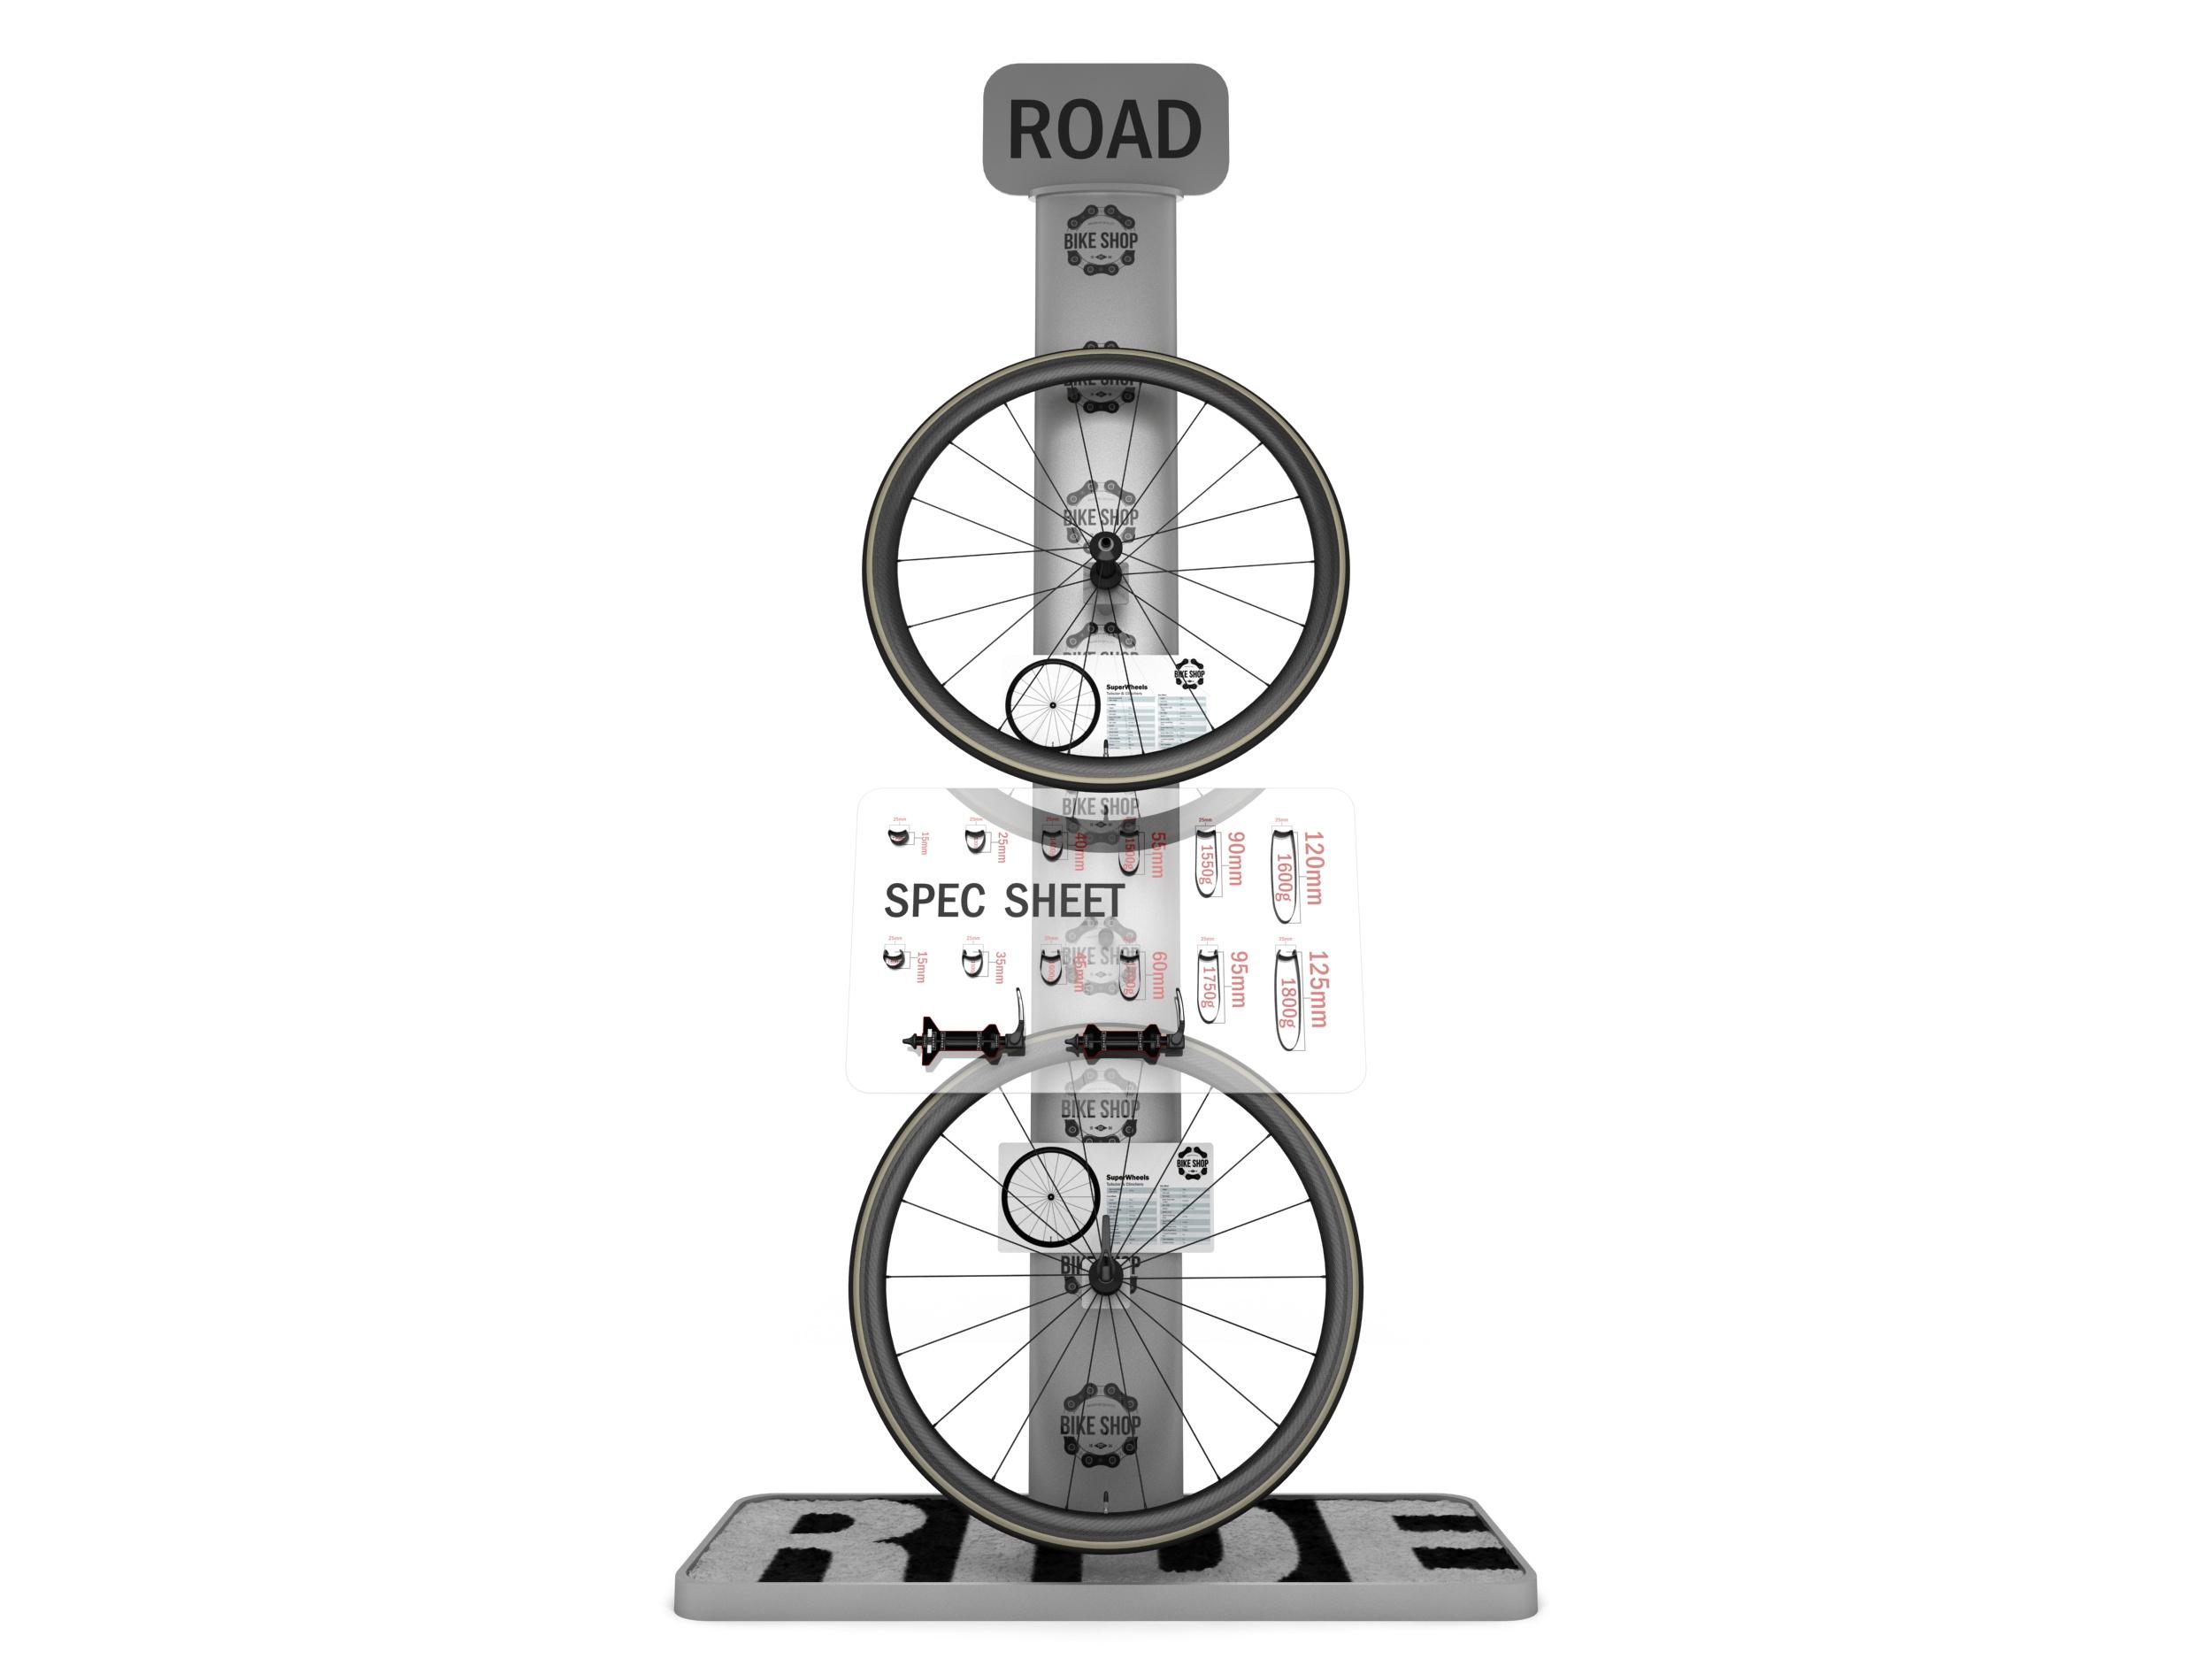 POS_Road Wheel Stand_011.jpg